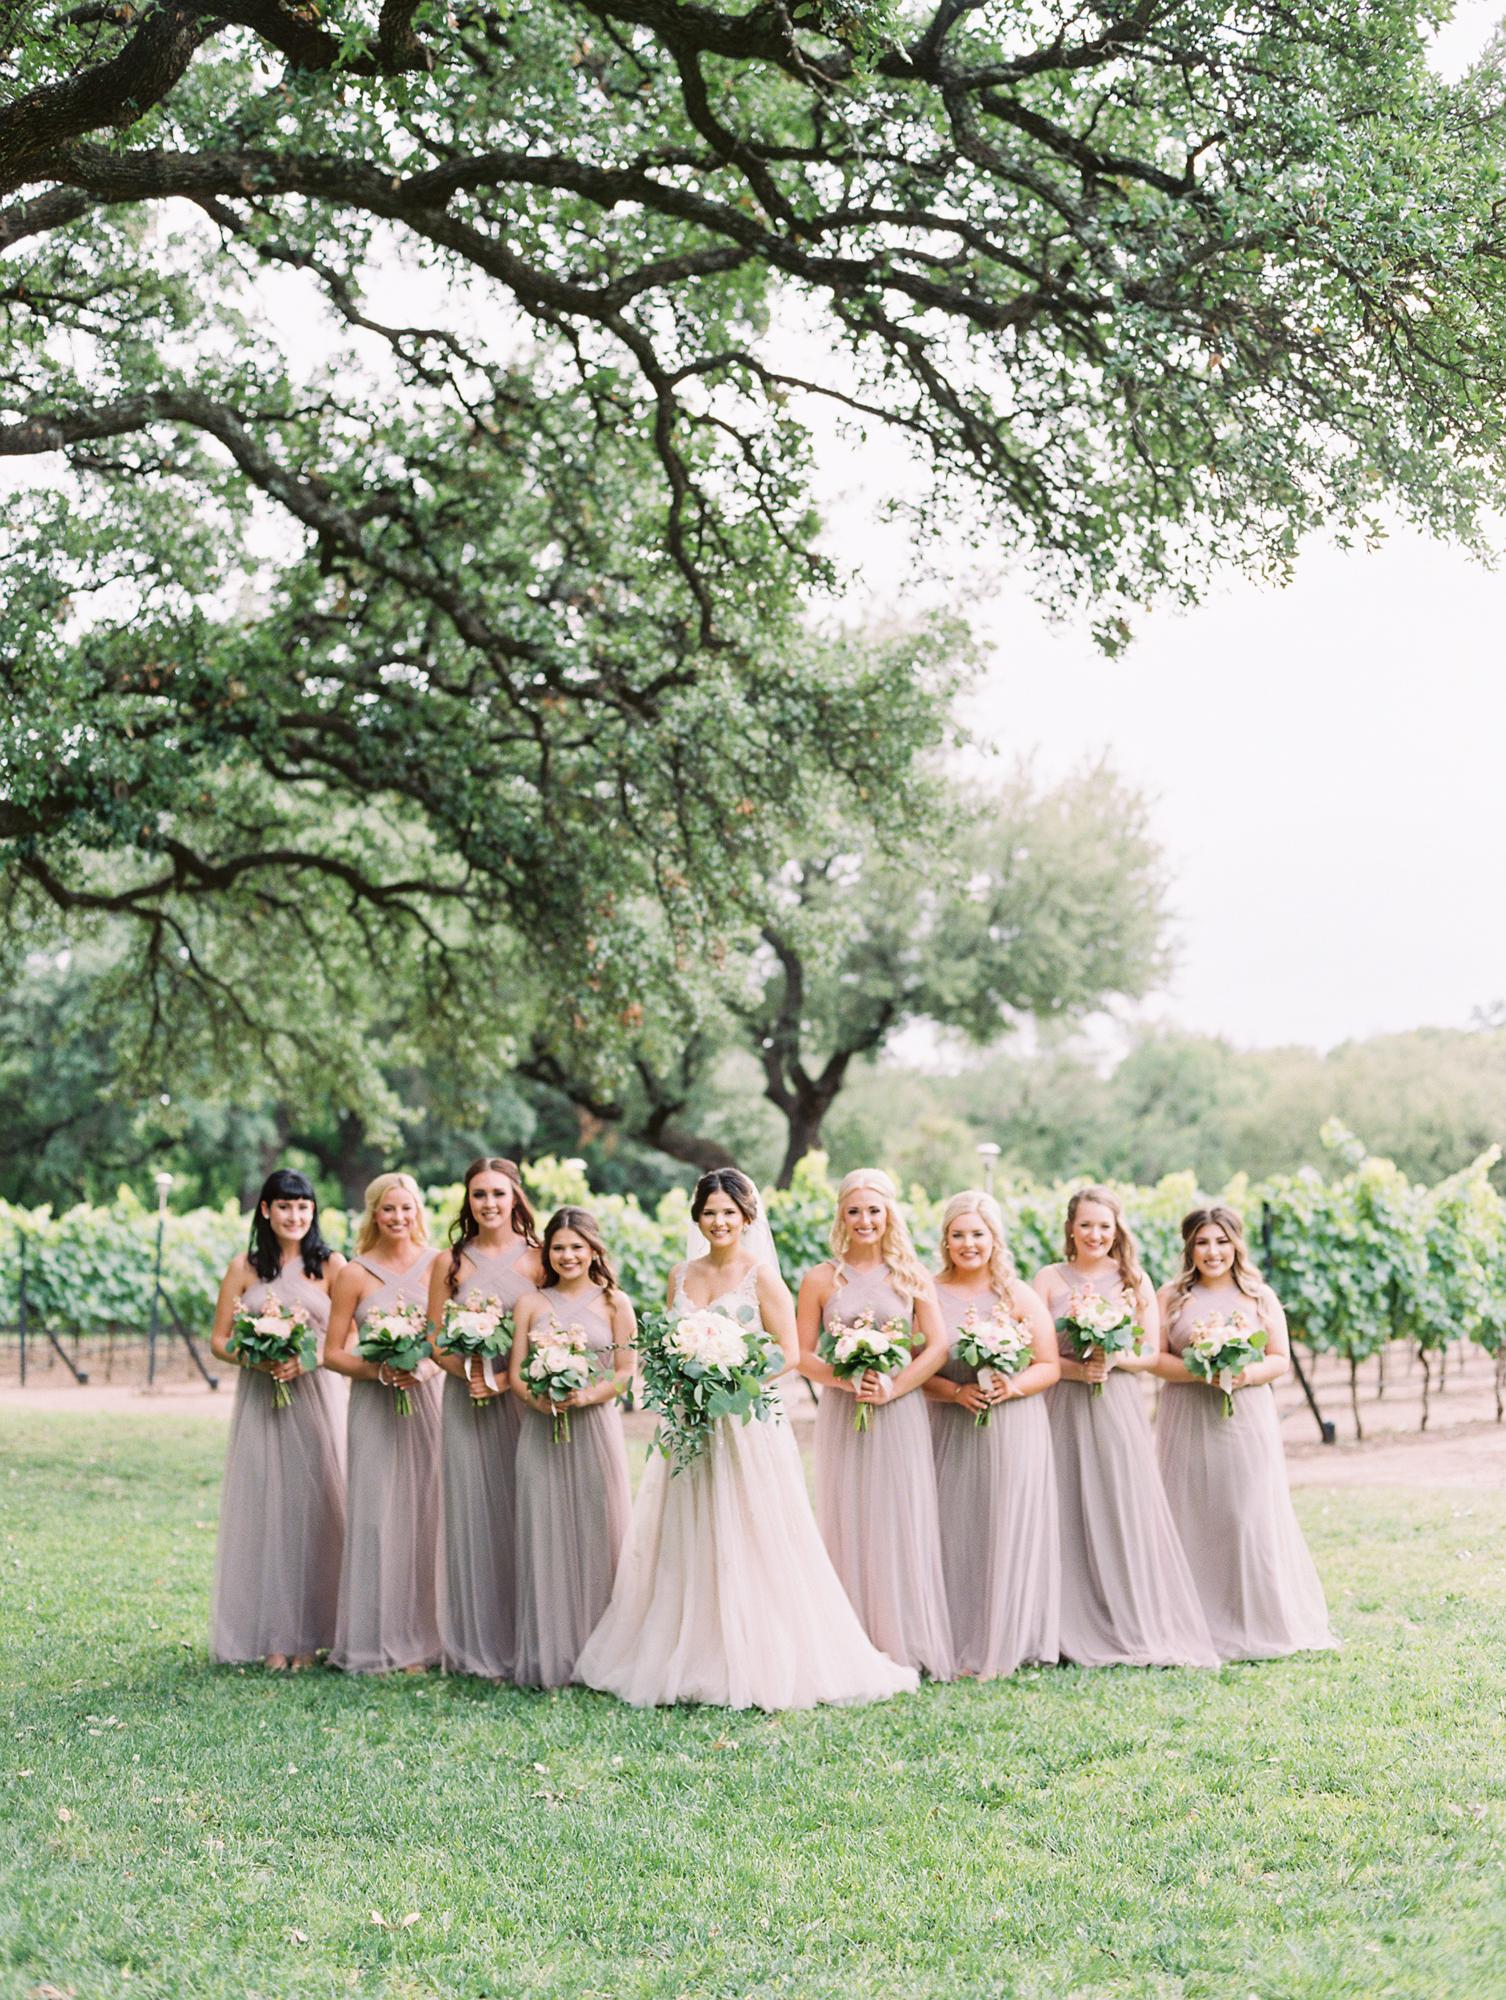 Elegant Spring Vineyard Wedding | Film Wedding Photographer | Austin Wedding Photographer | Romantic Taupe Bridesmaid Dresses, Flowy Bridal Bouquet | Britni Dean Photography // britnidean.com